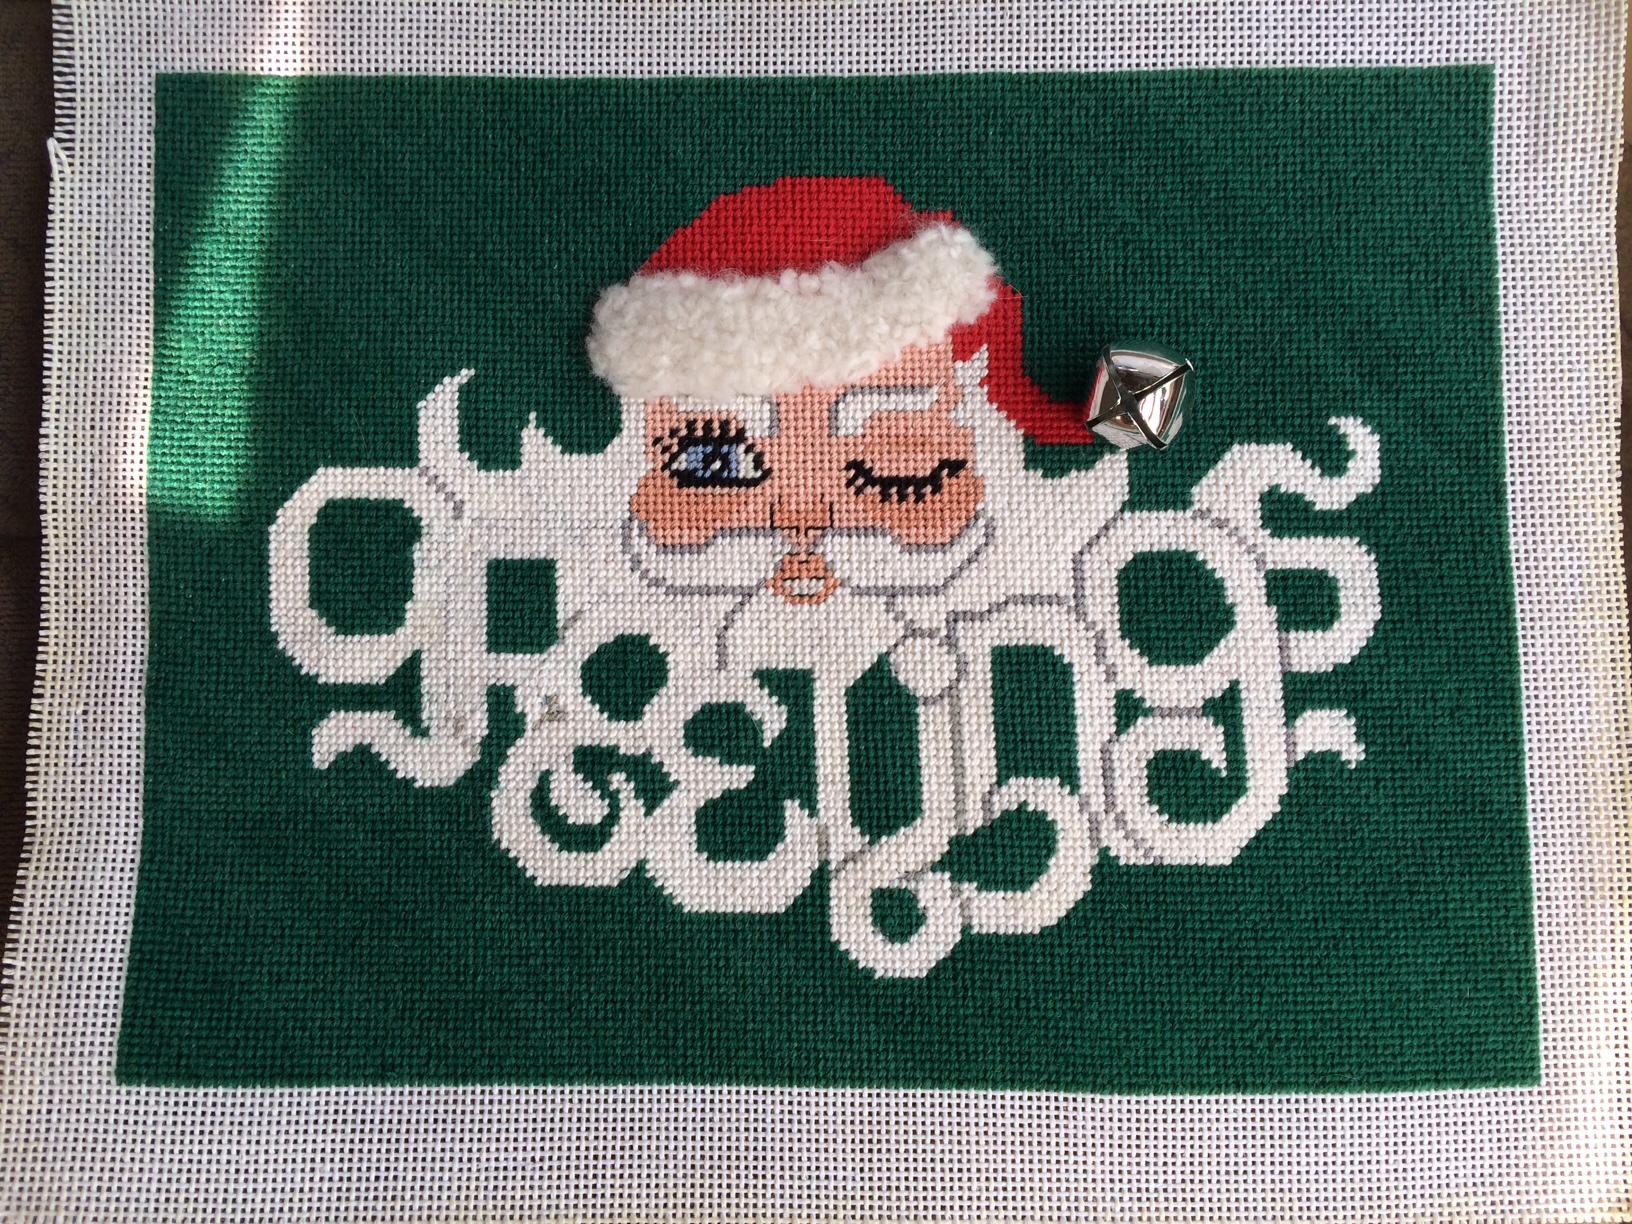 Greetings Holiday Needlepoint